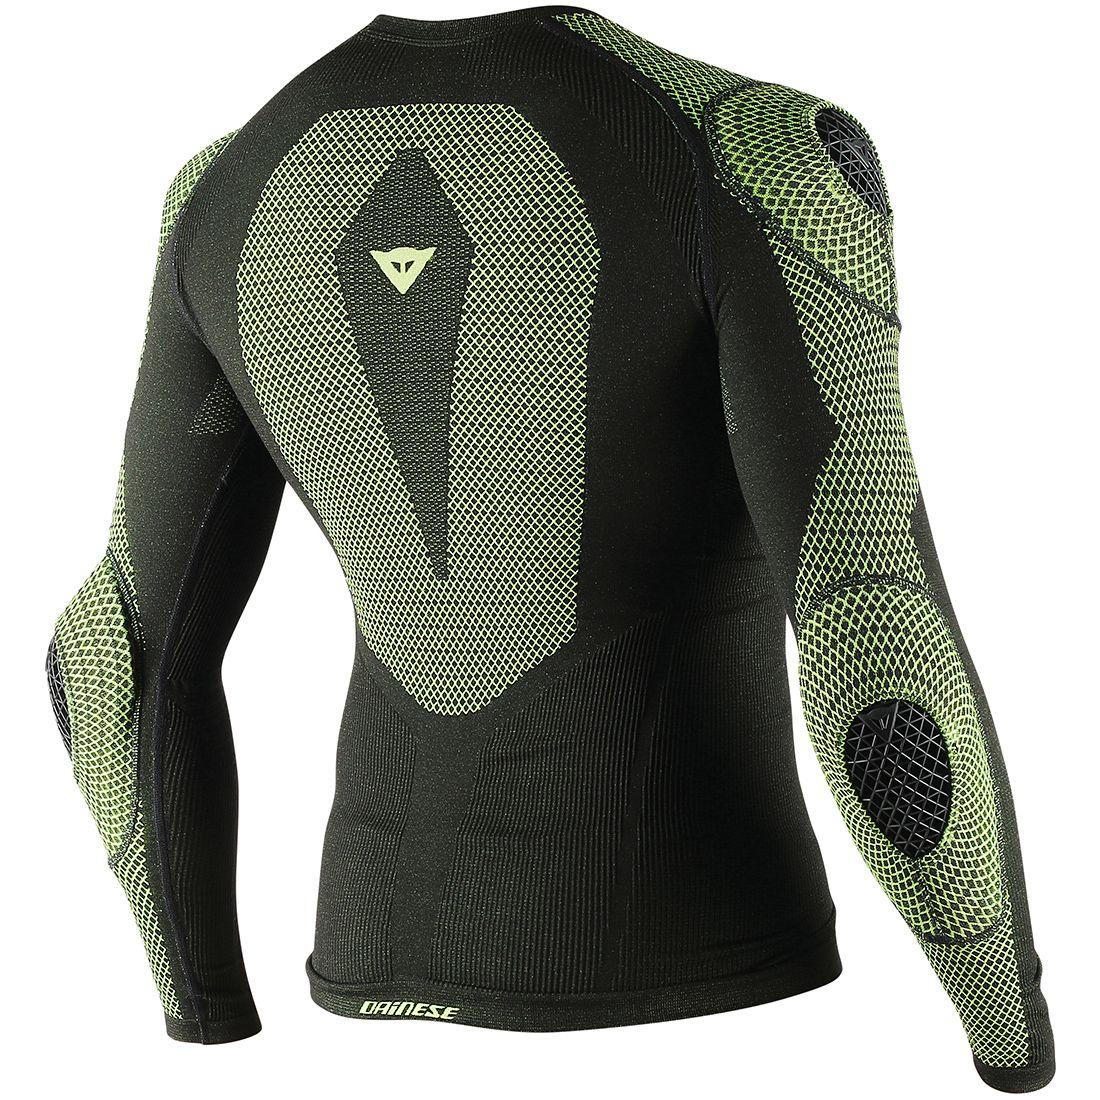 【DAINESE】D-CORE    ARMOR TEE LS 護肩・肘內穿衣 - 「Webike-摩托百貨」